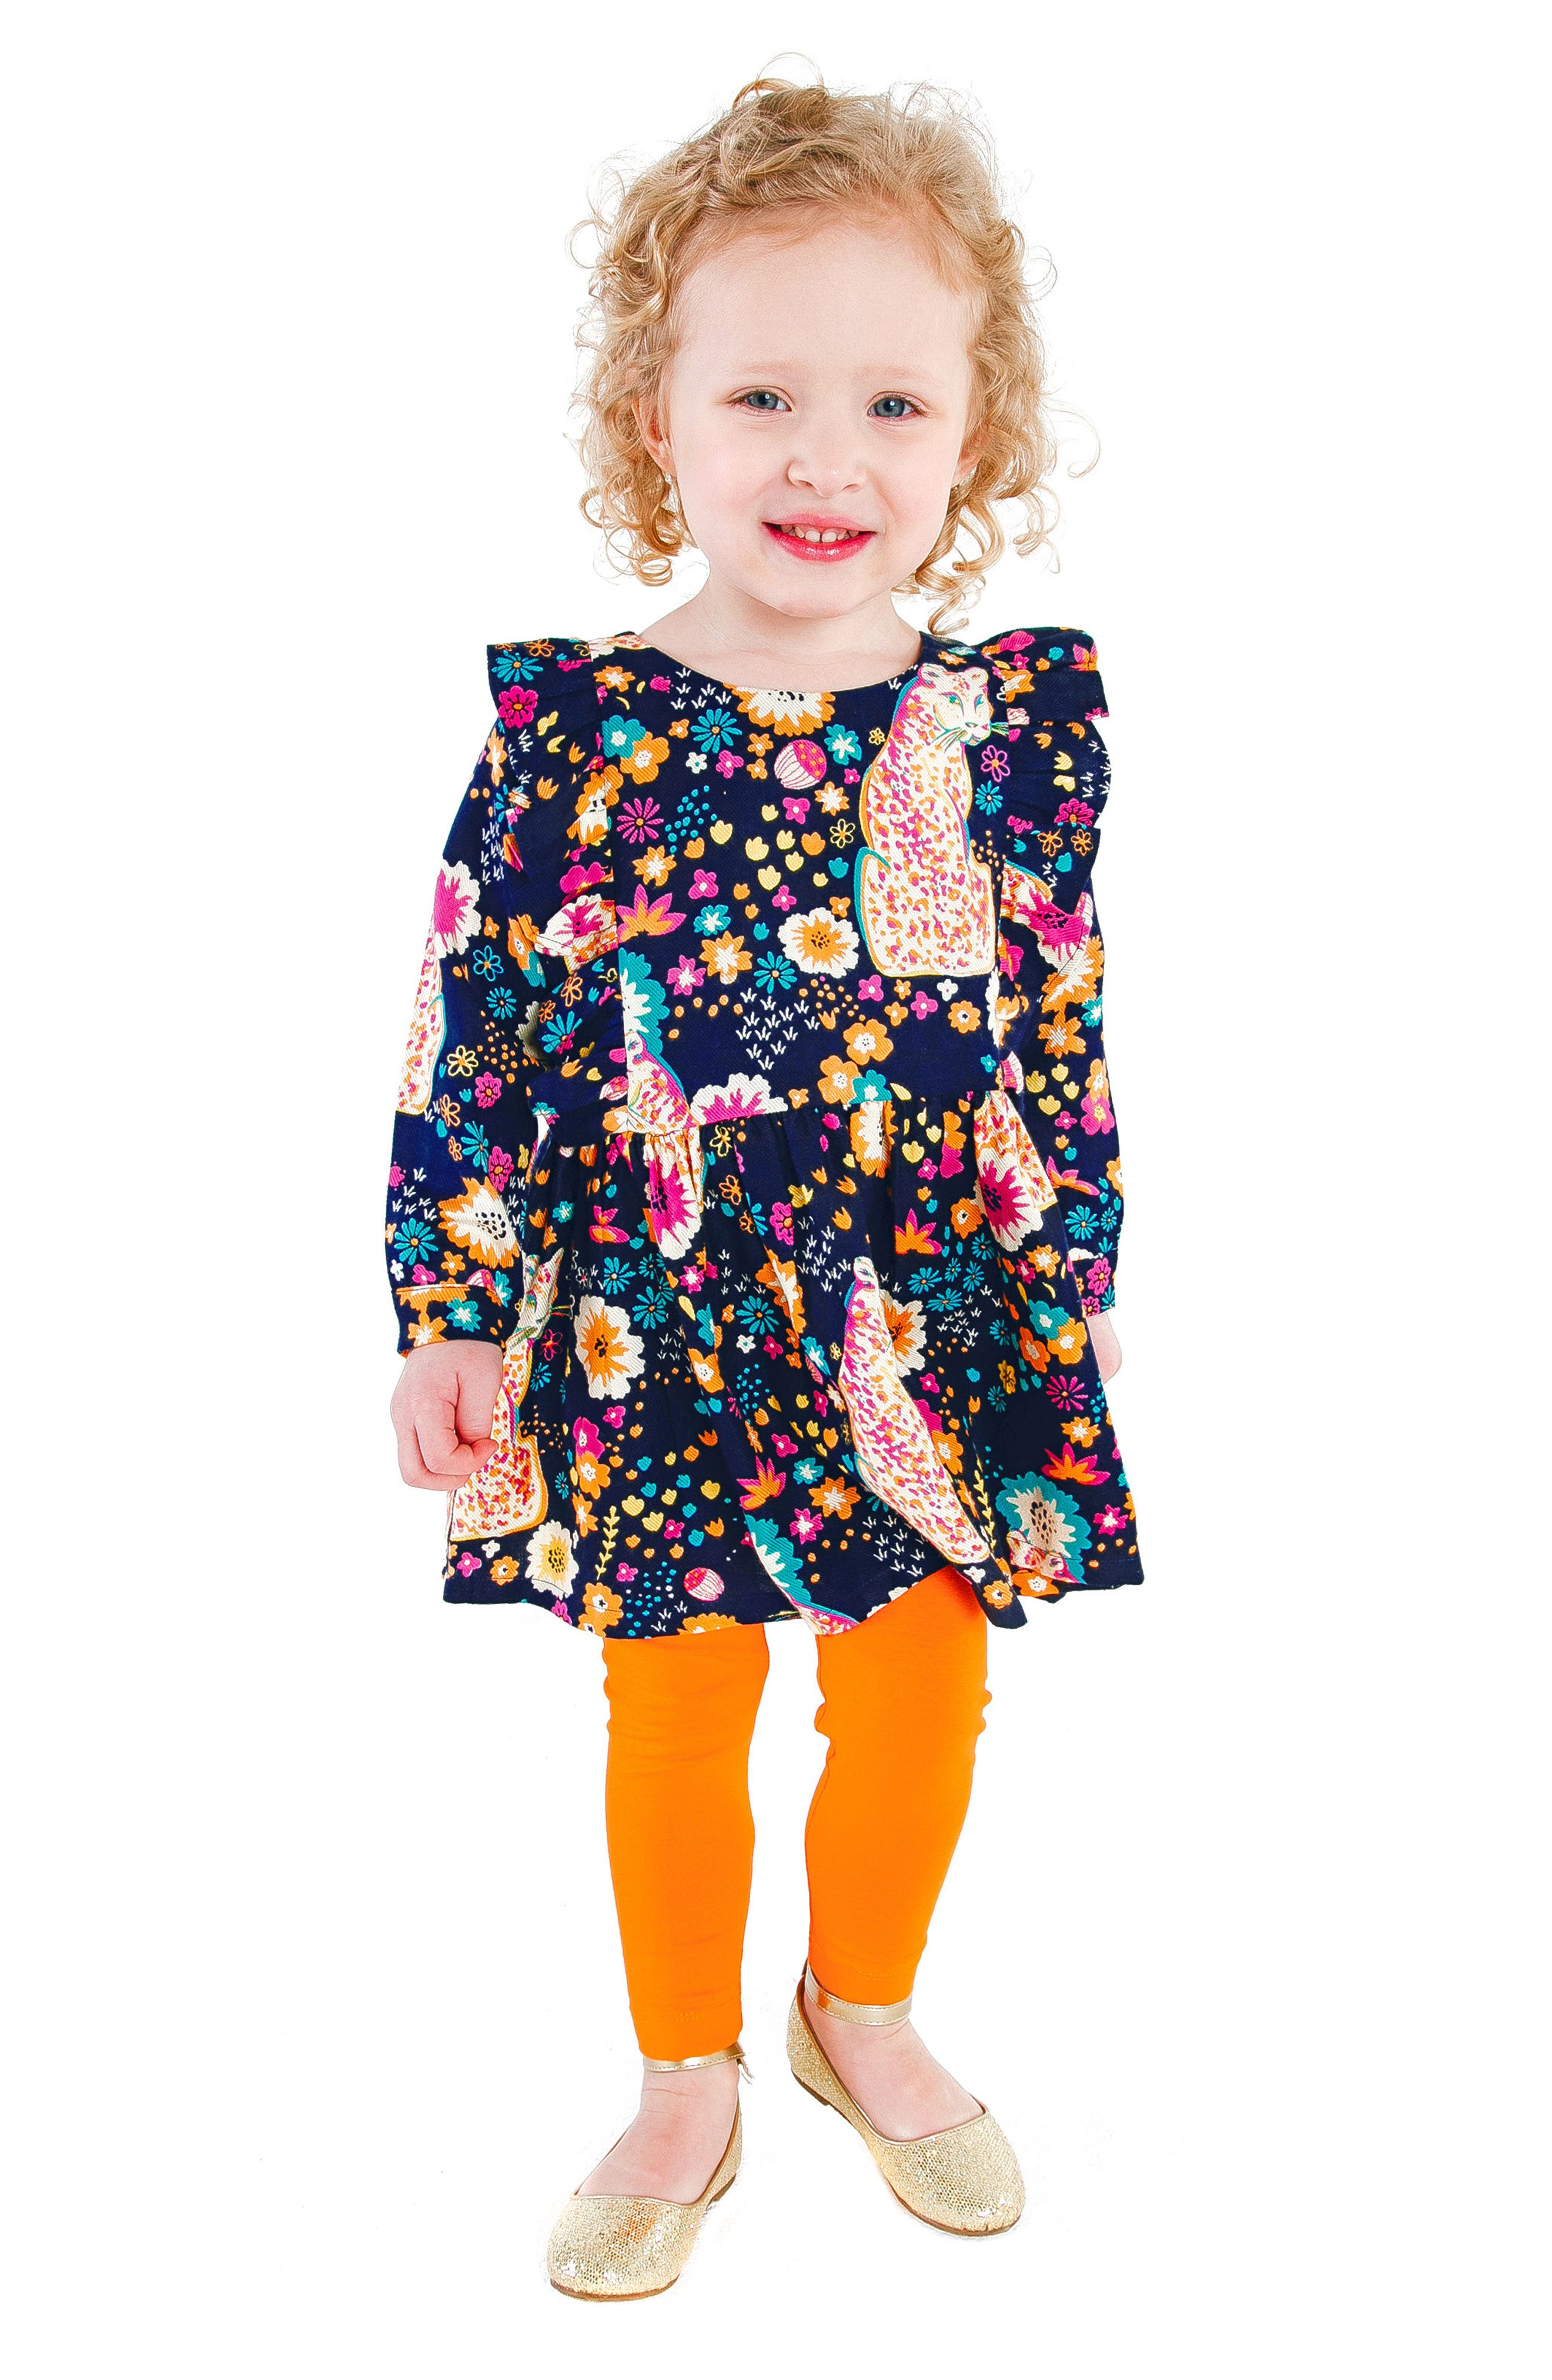 Fantasia Cheetah Dress,                             Alternate thumbnail 2, color,                             NAVY